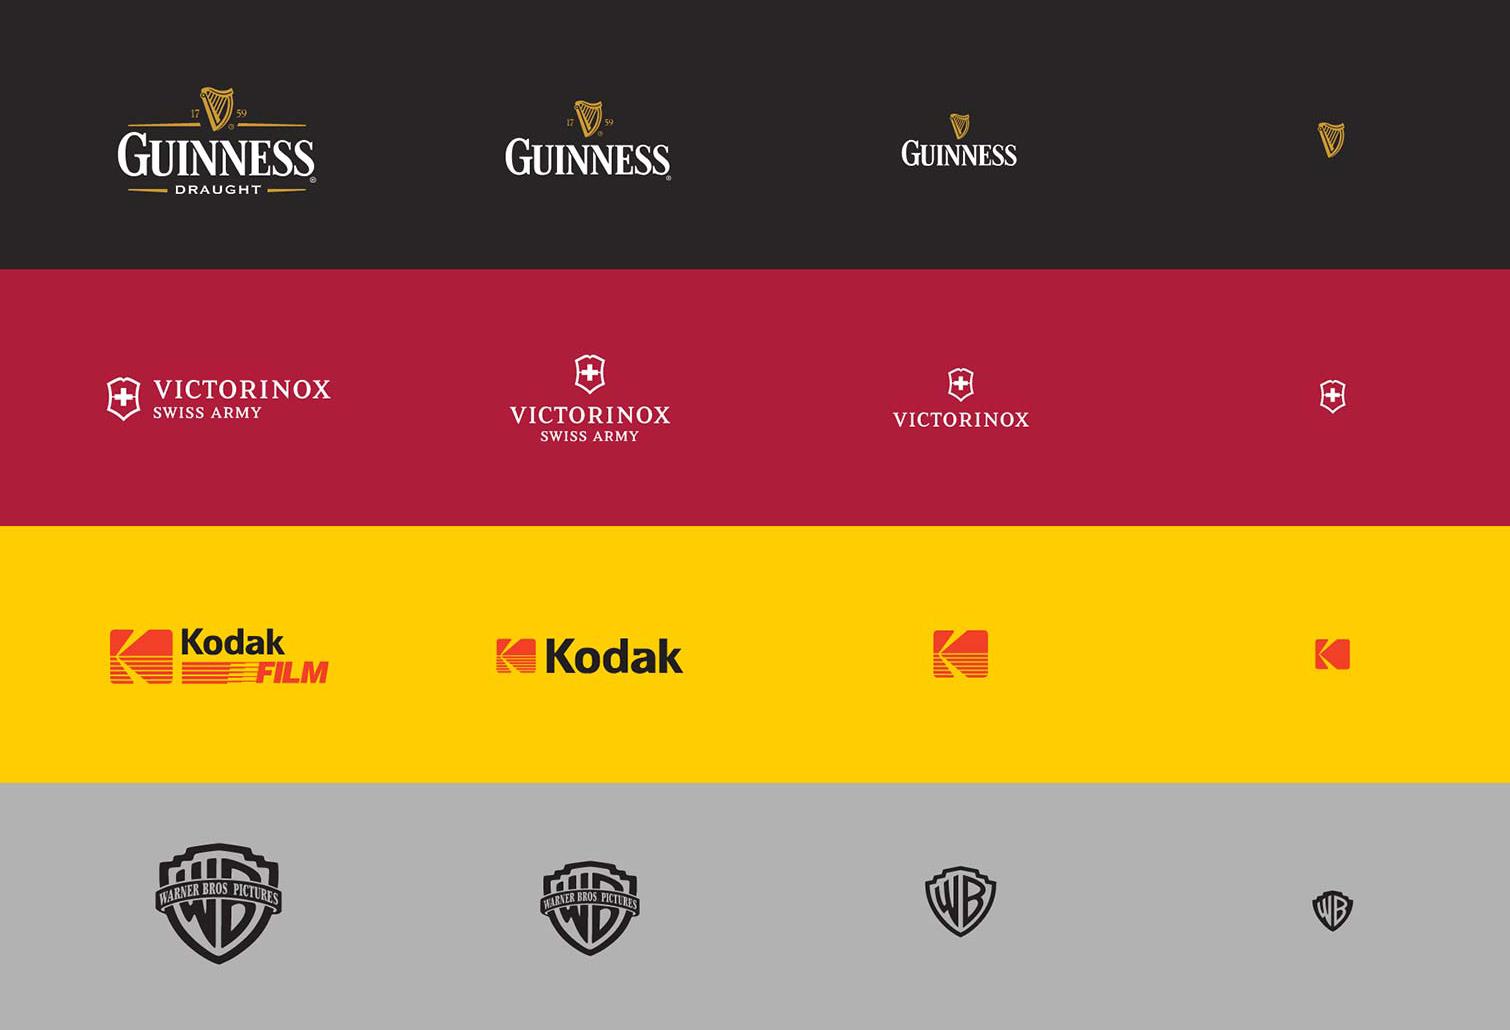 Responsive Logos (Source: justcreative.com)